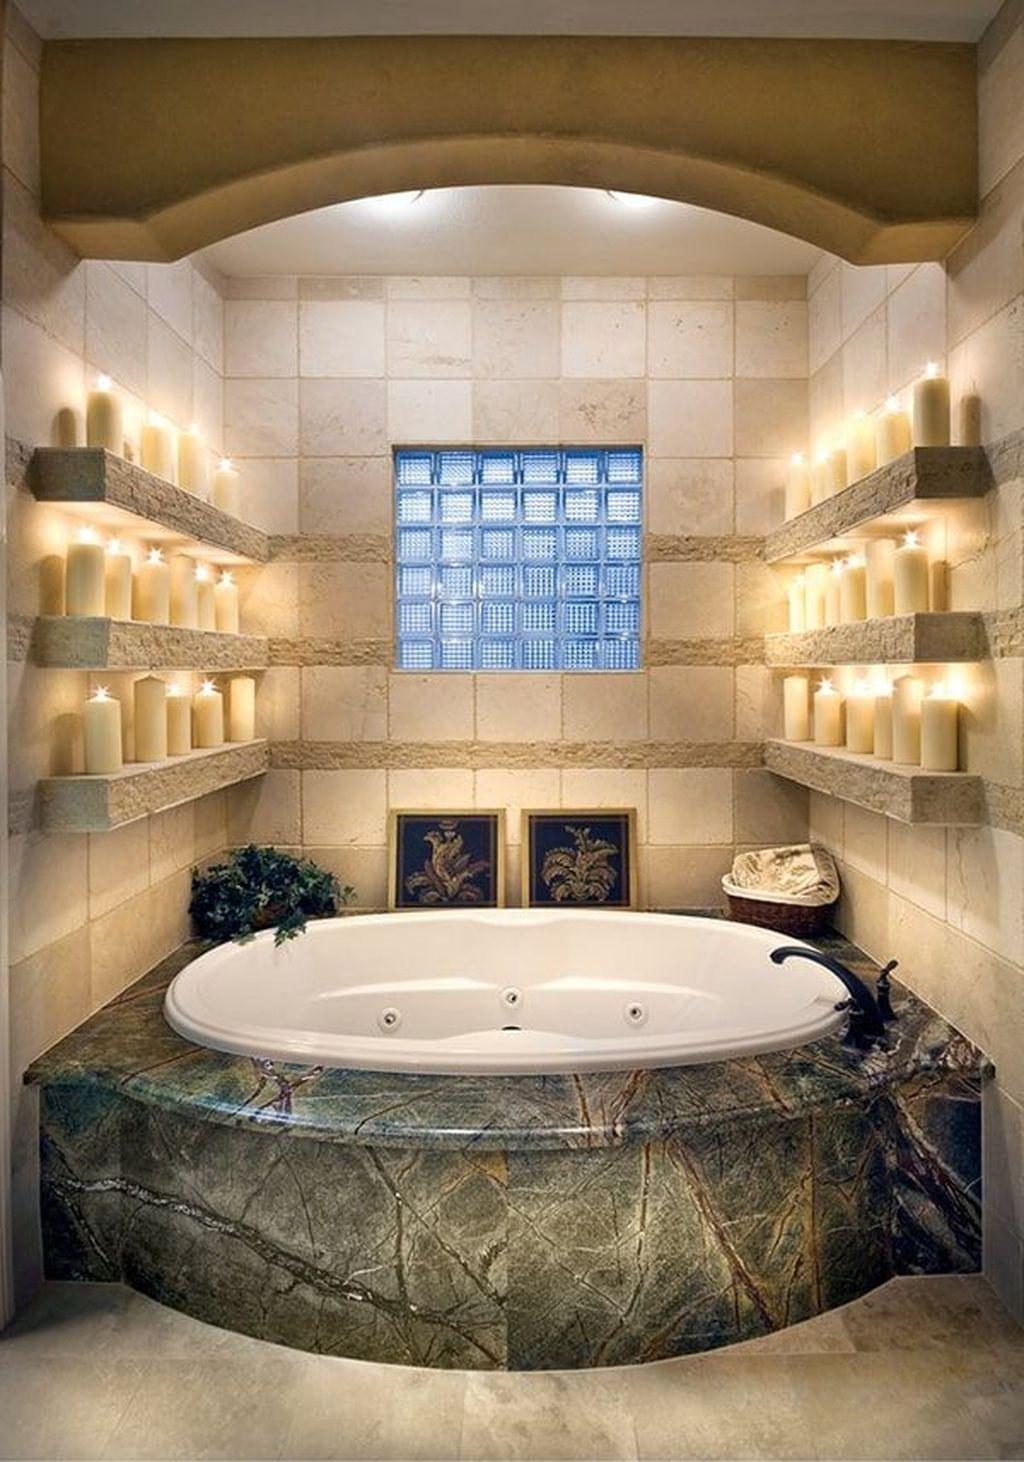 38 The Best Romantic Bathroom Ideas Perfect For Valentine ...